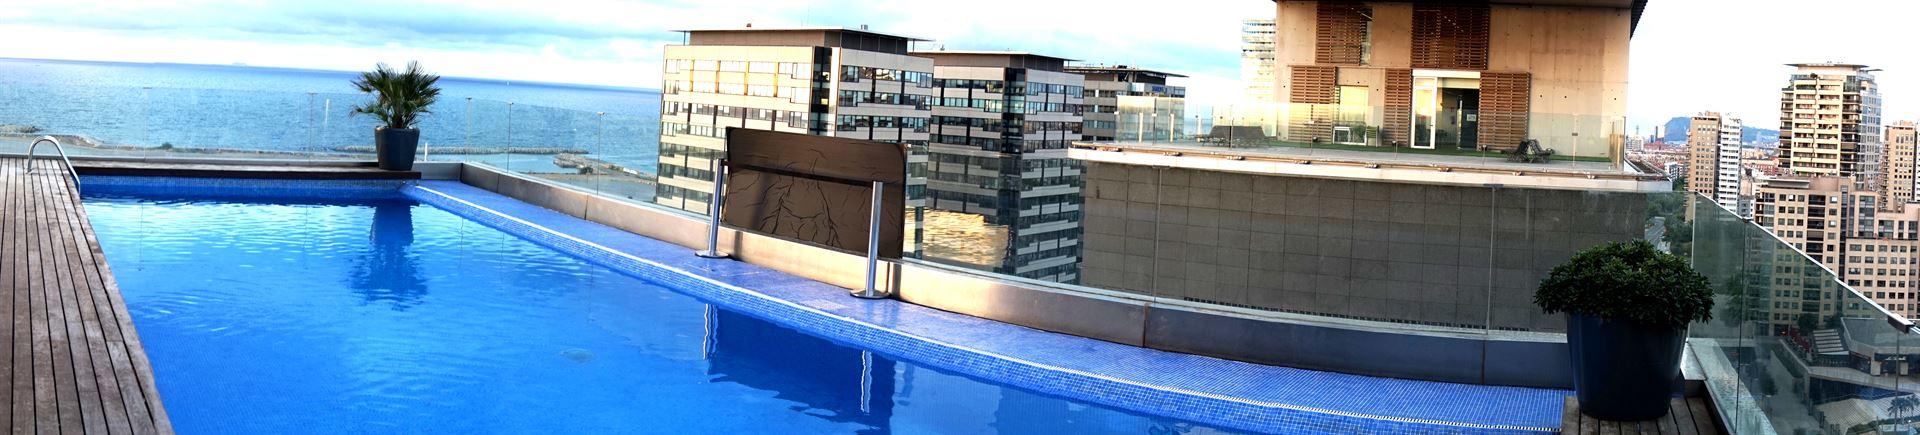 uimaallas_panorama